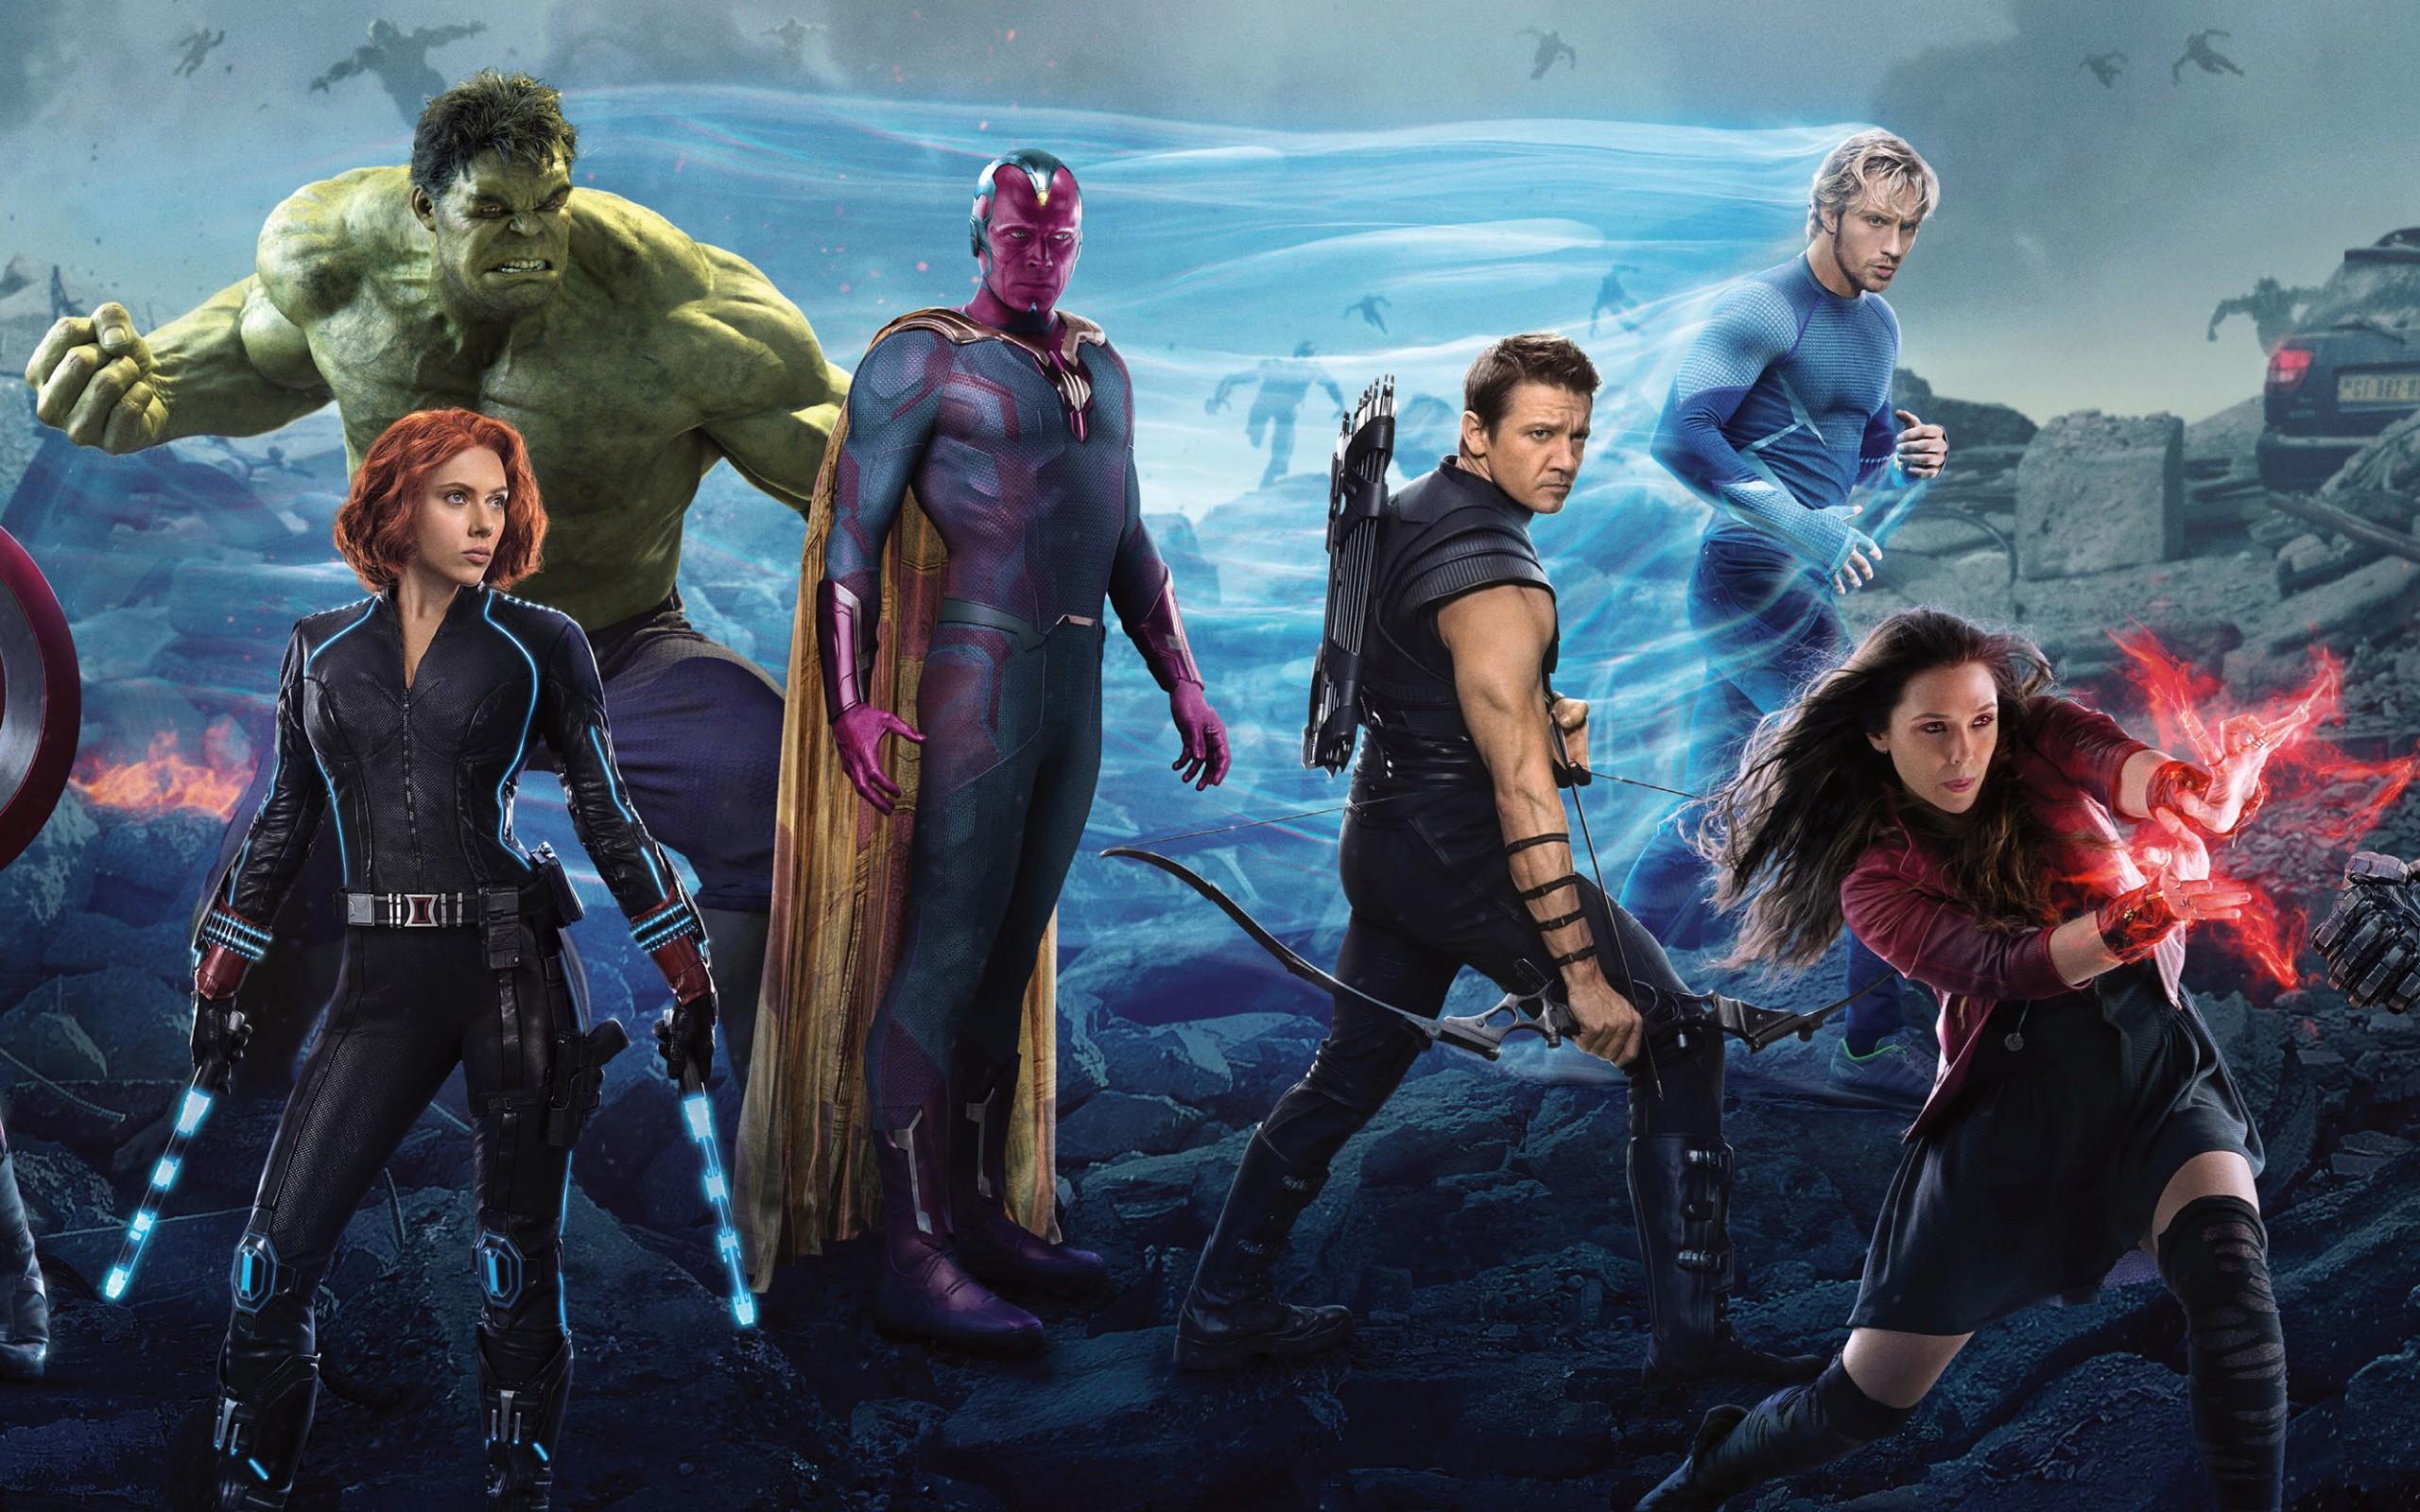 происхождения фото всех мстителей марвел ситкома